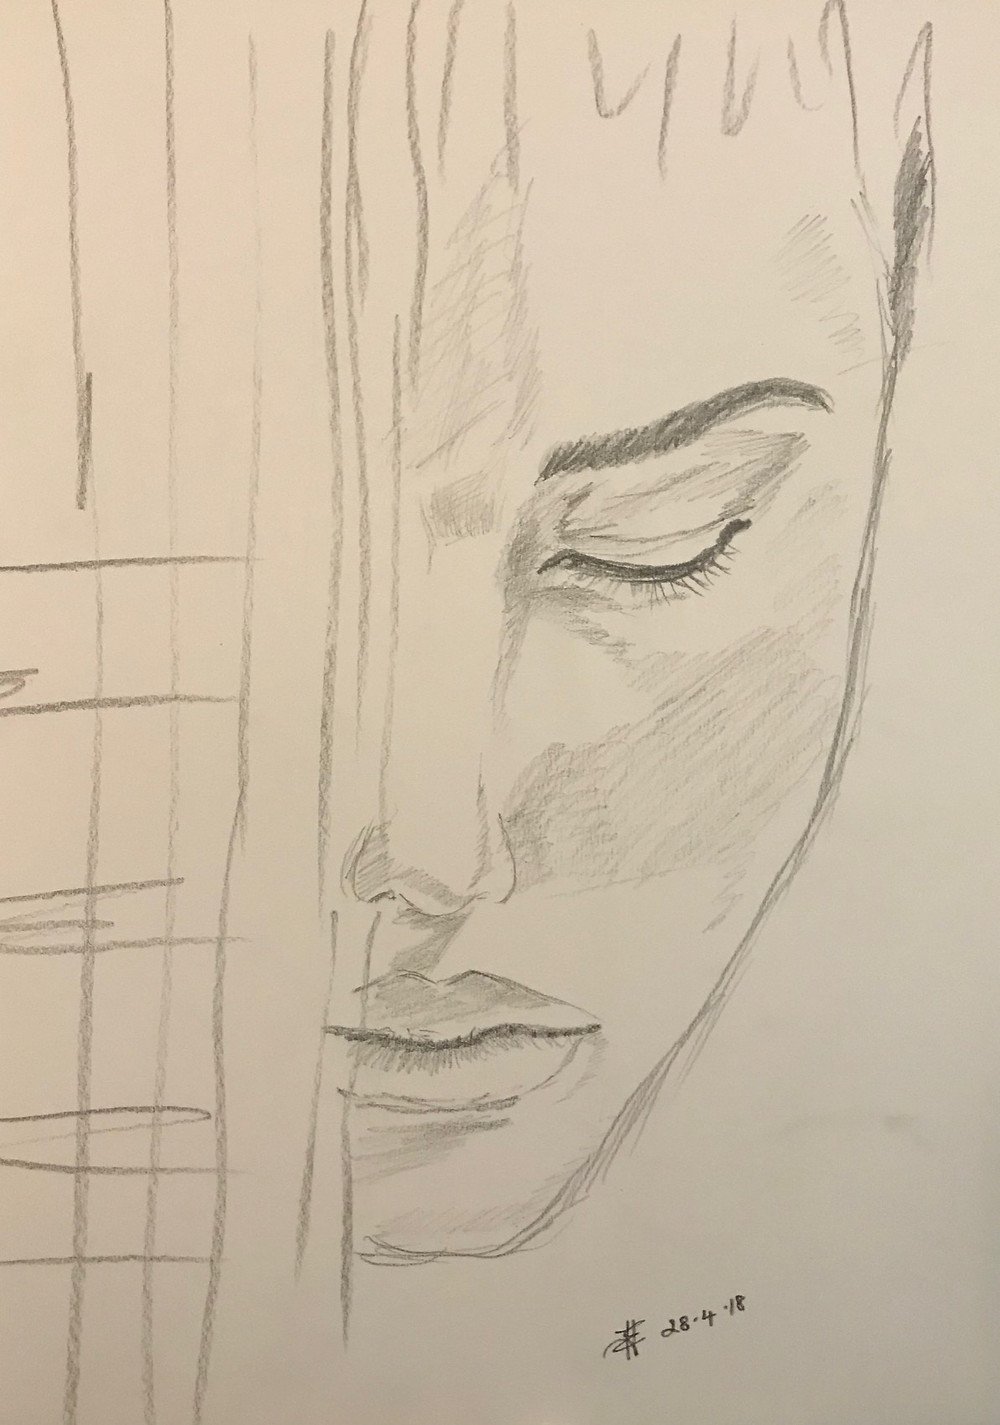 Pencil Sketch of a girl's face by Leeza A. Harris